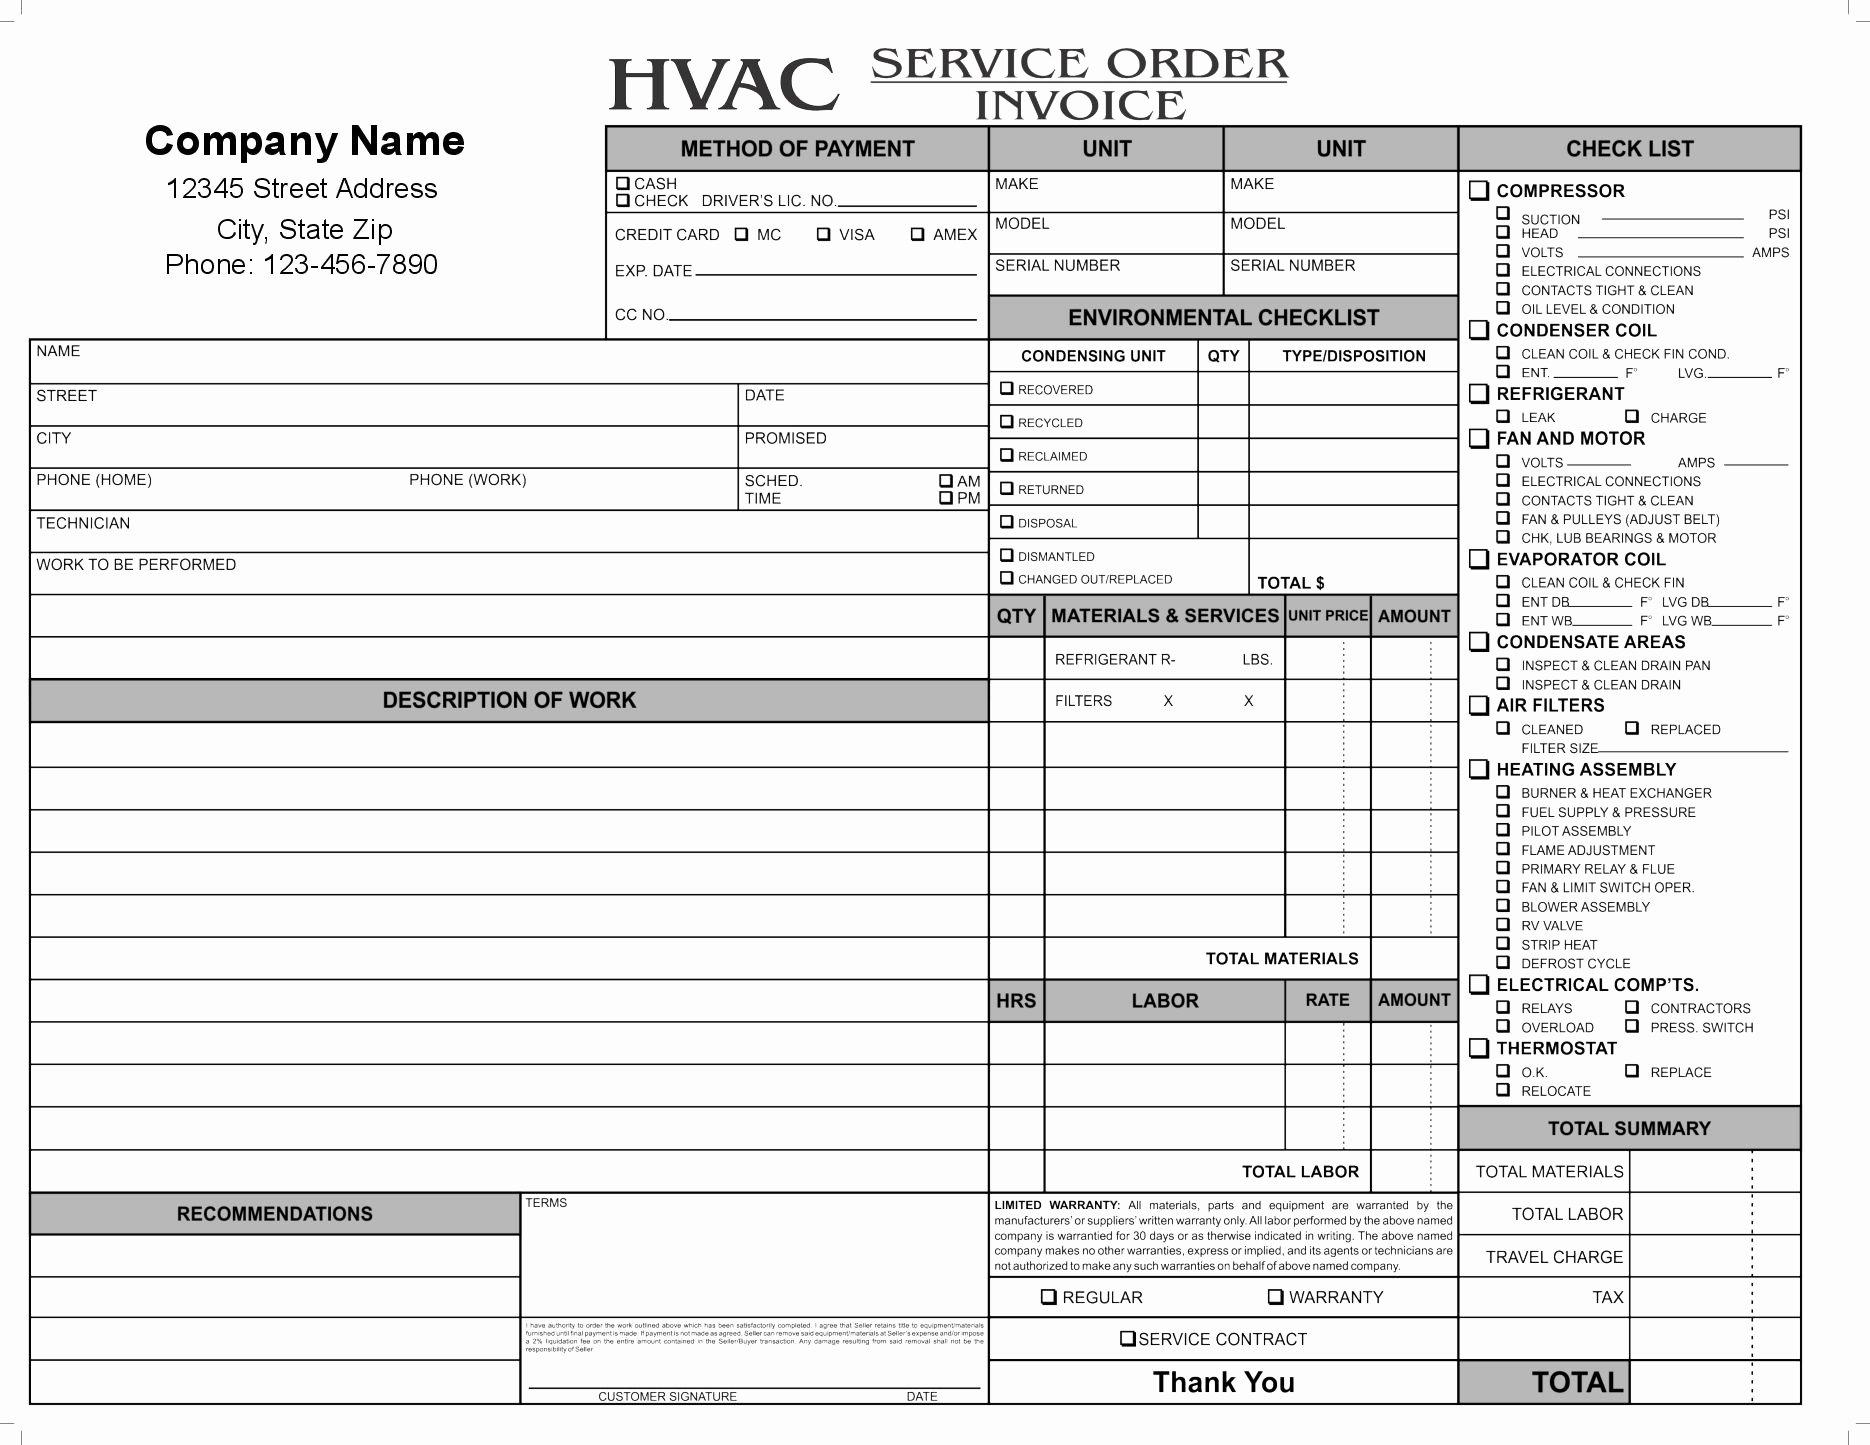 Hvac Service order Invoice Template New 11 Hvac Invoice Template Free top Invoice Templates Hvac